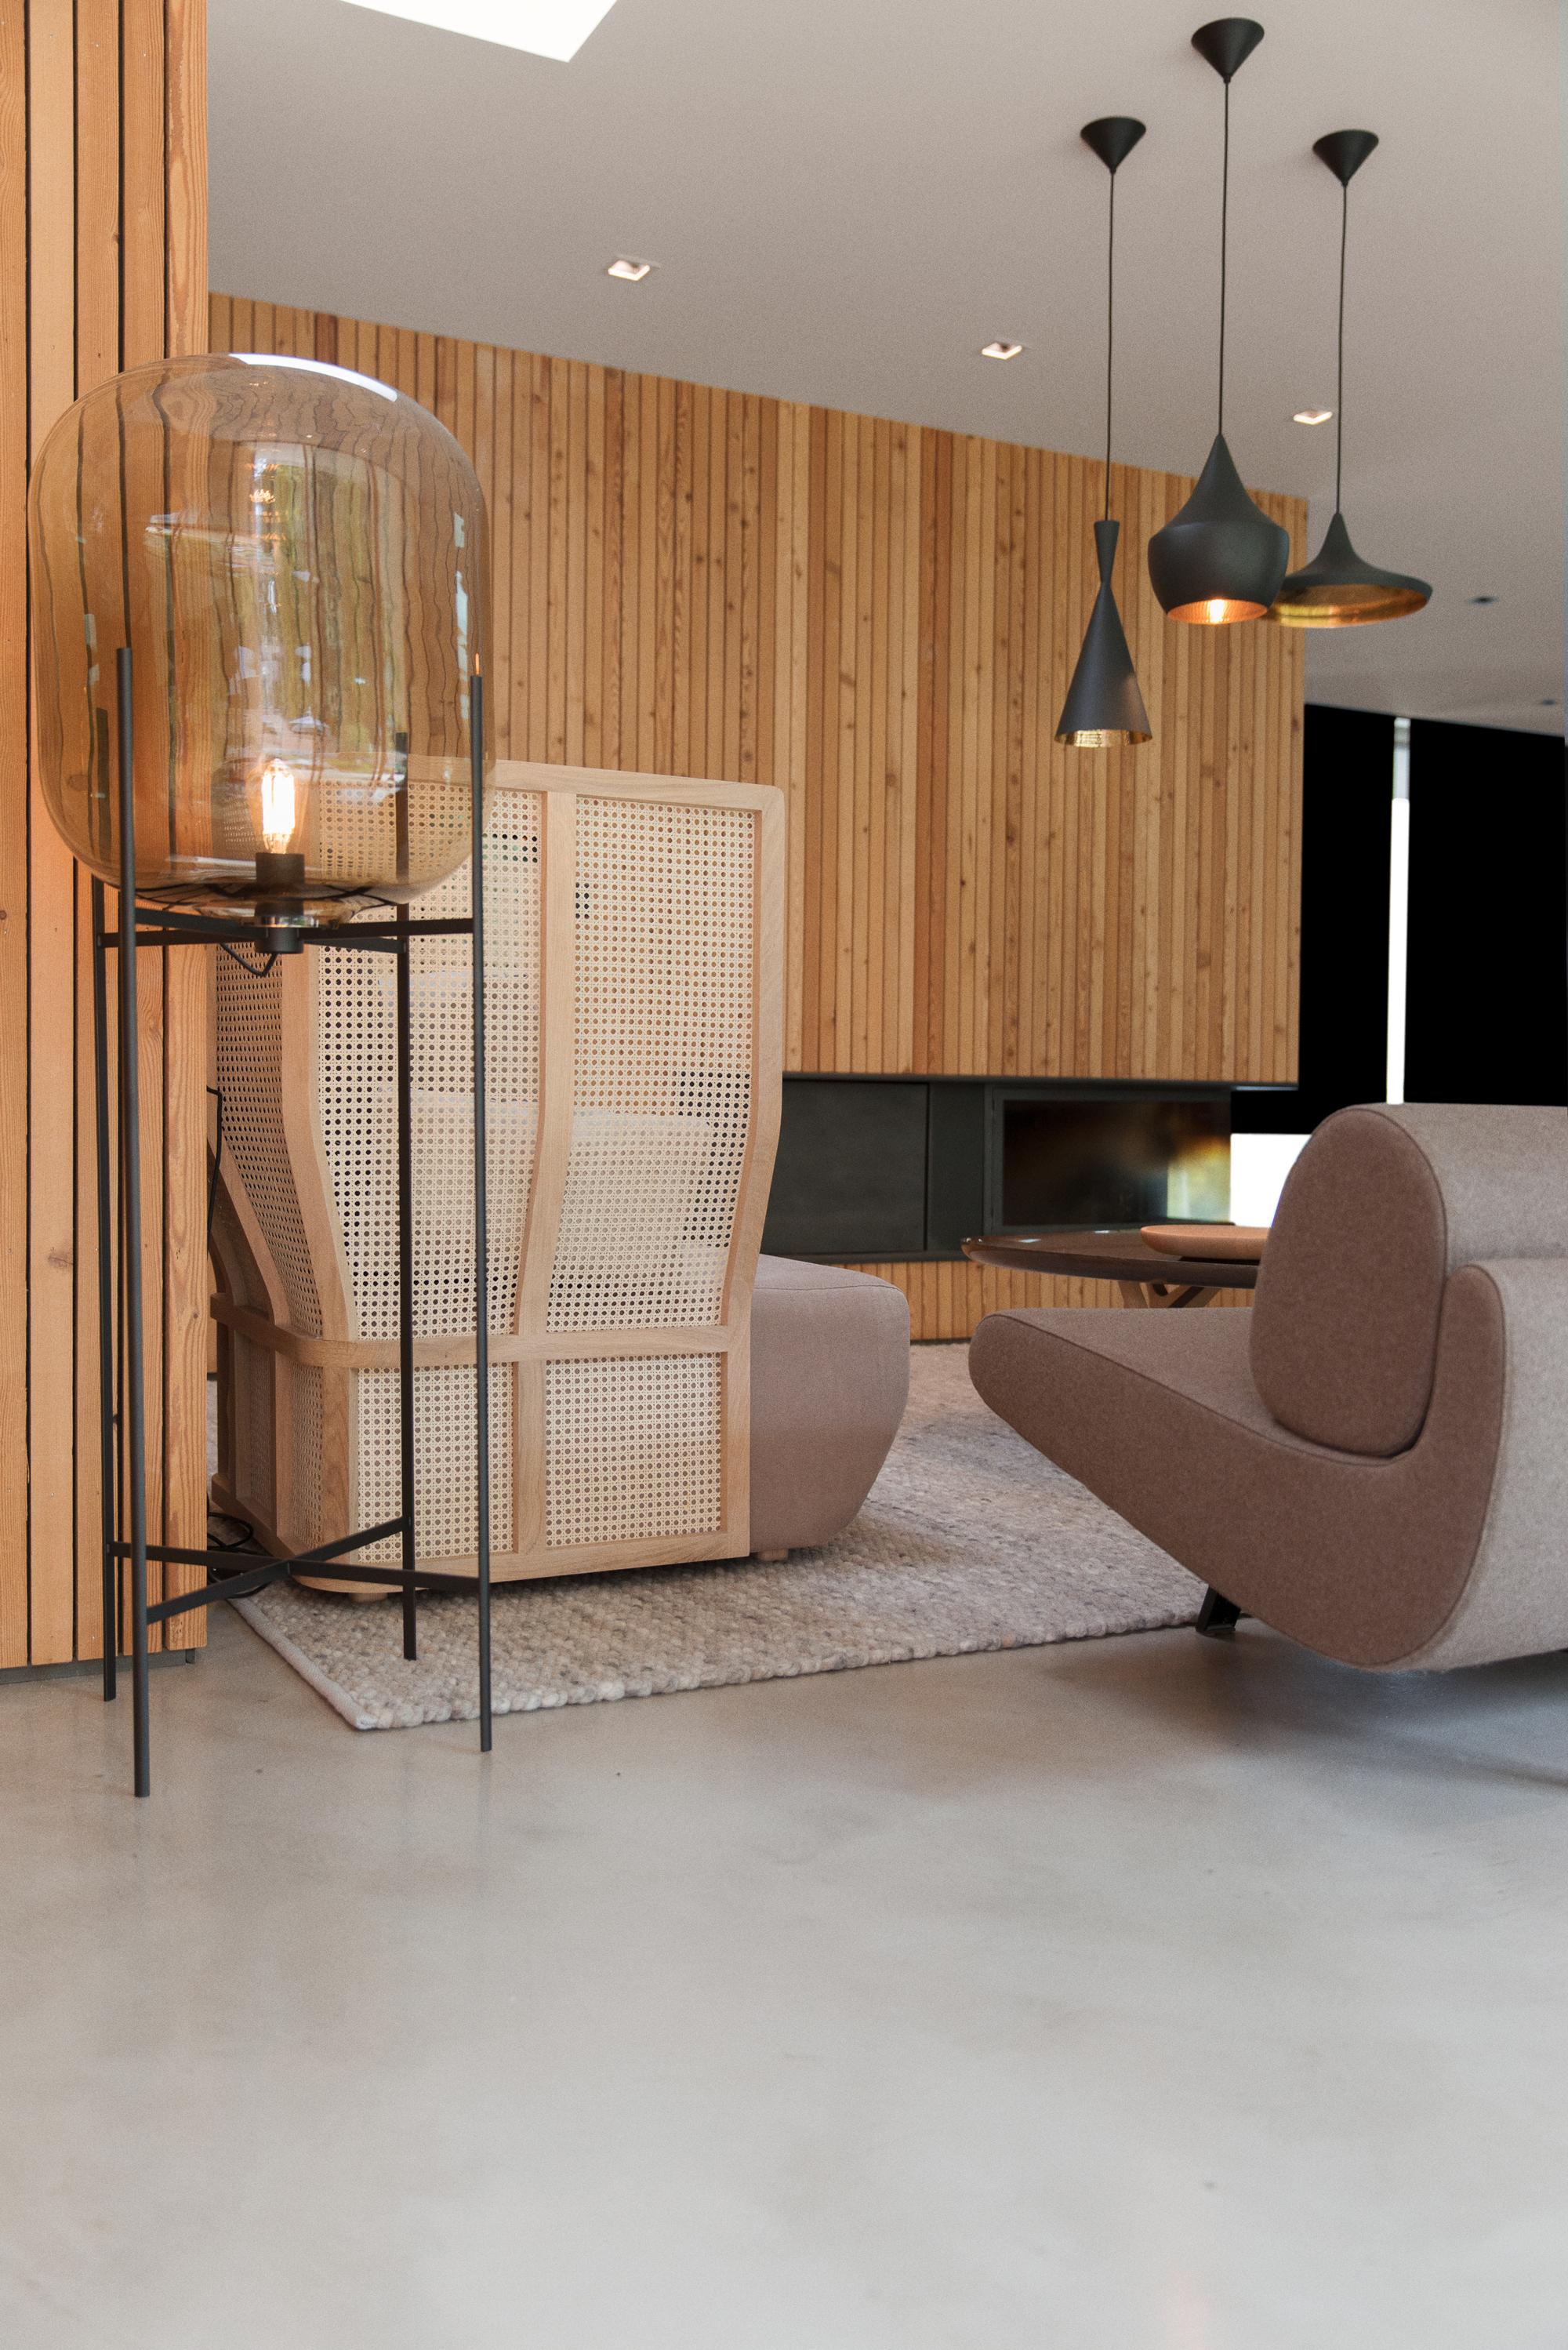 gallery of la maison etir e barres coquet 13. Black Bedroom Furniture Sets. Home Design Ideas